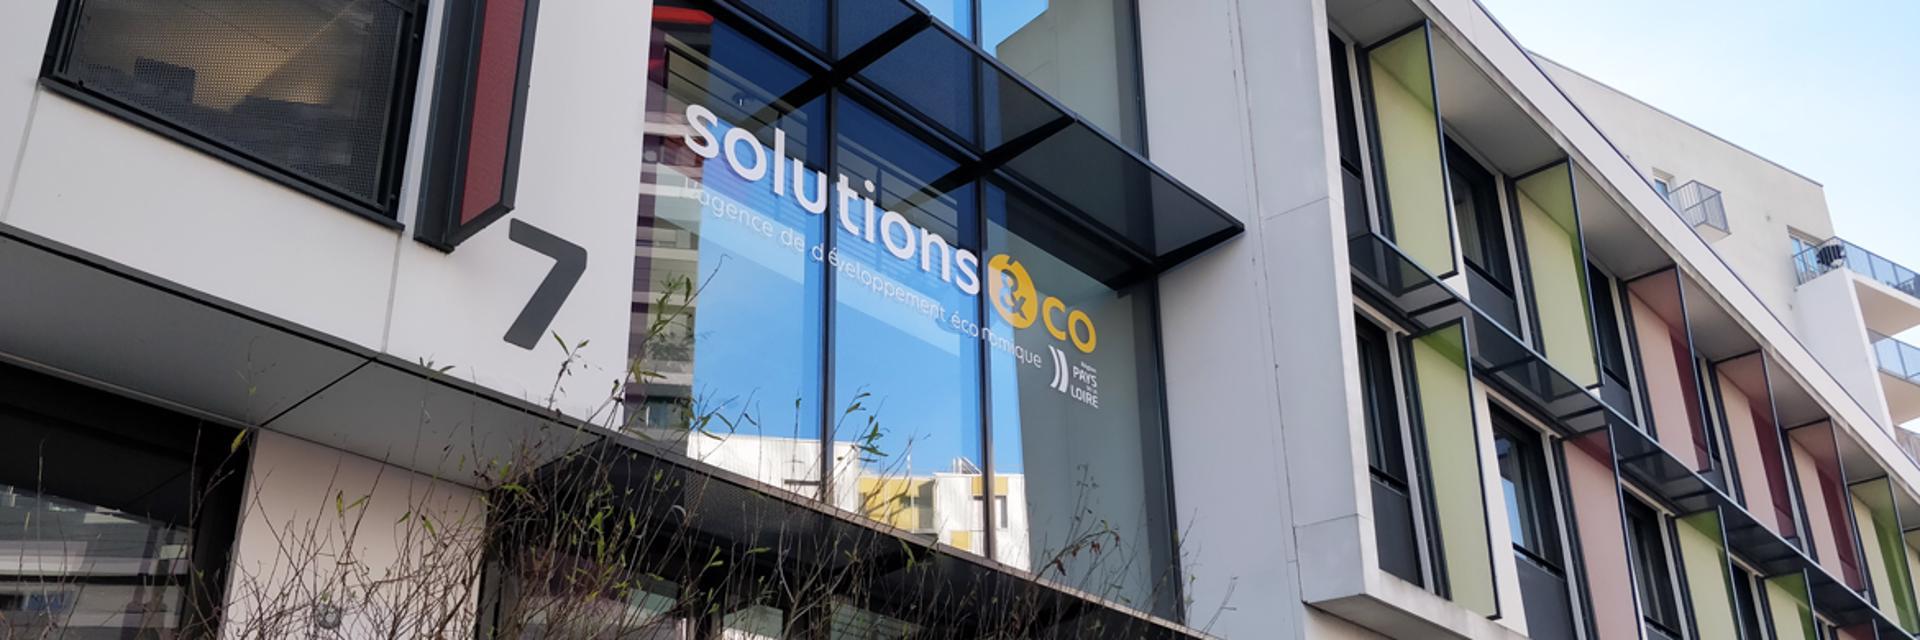 logo de Solutions&co